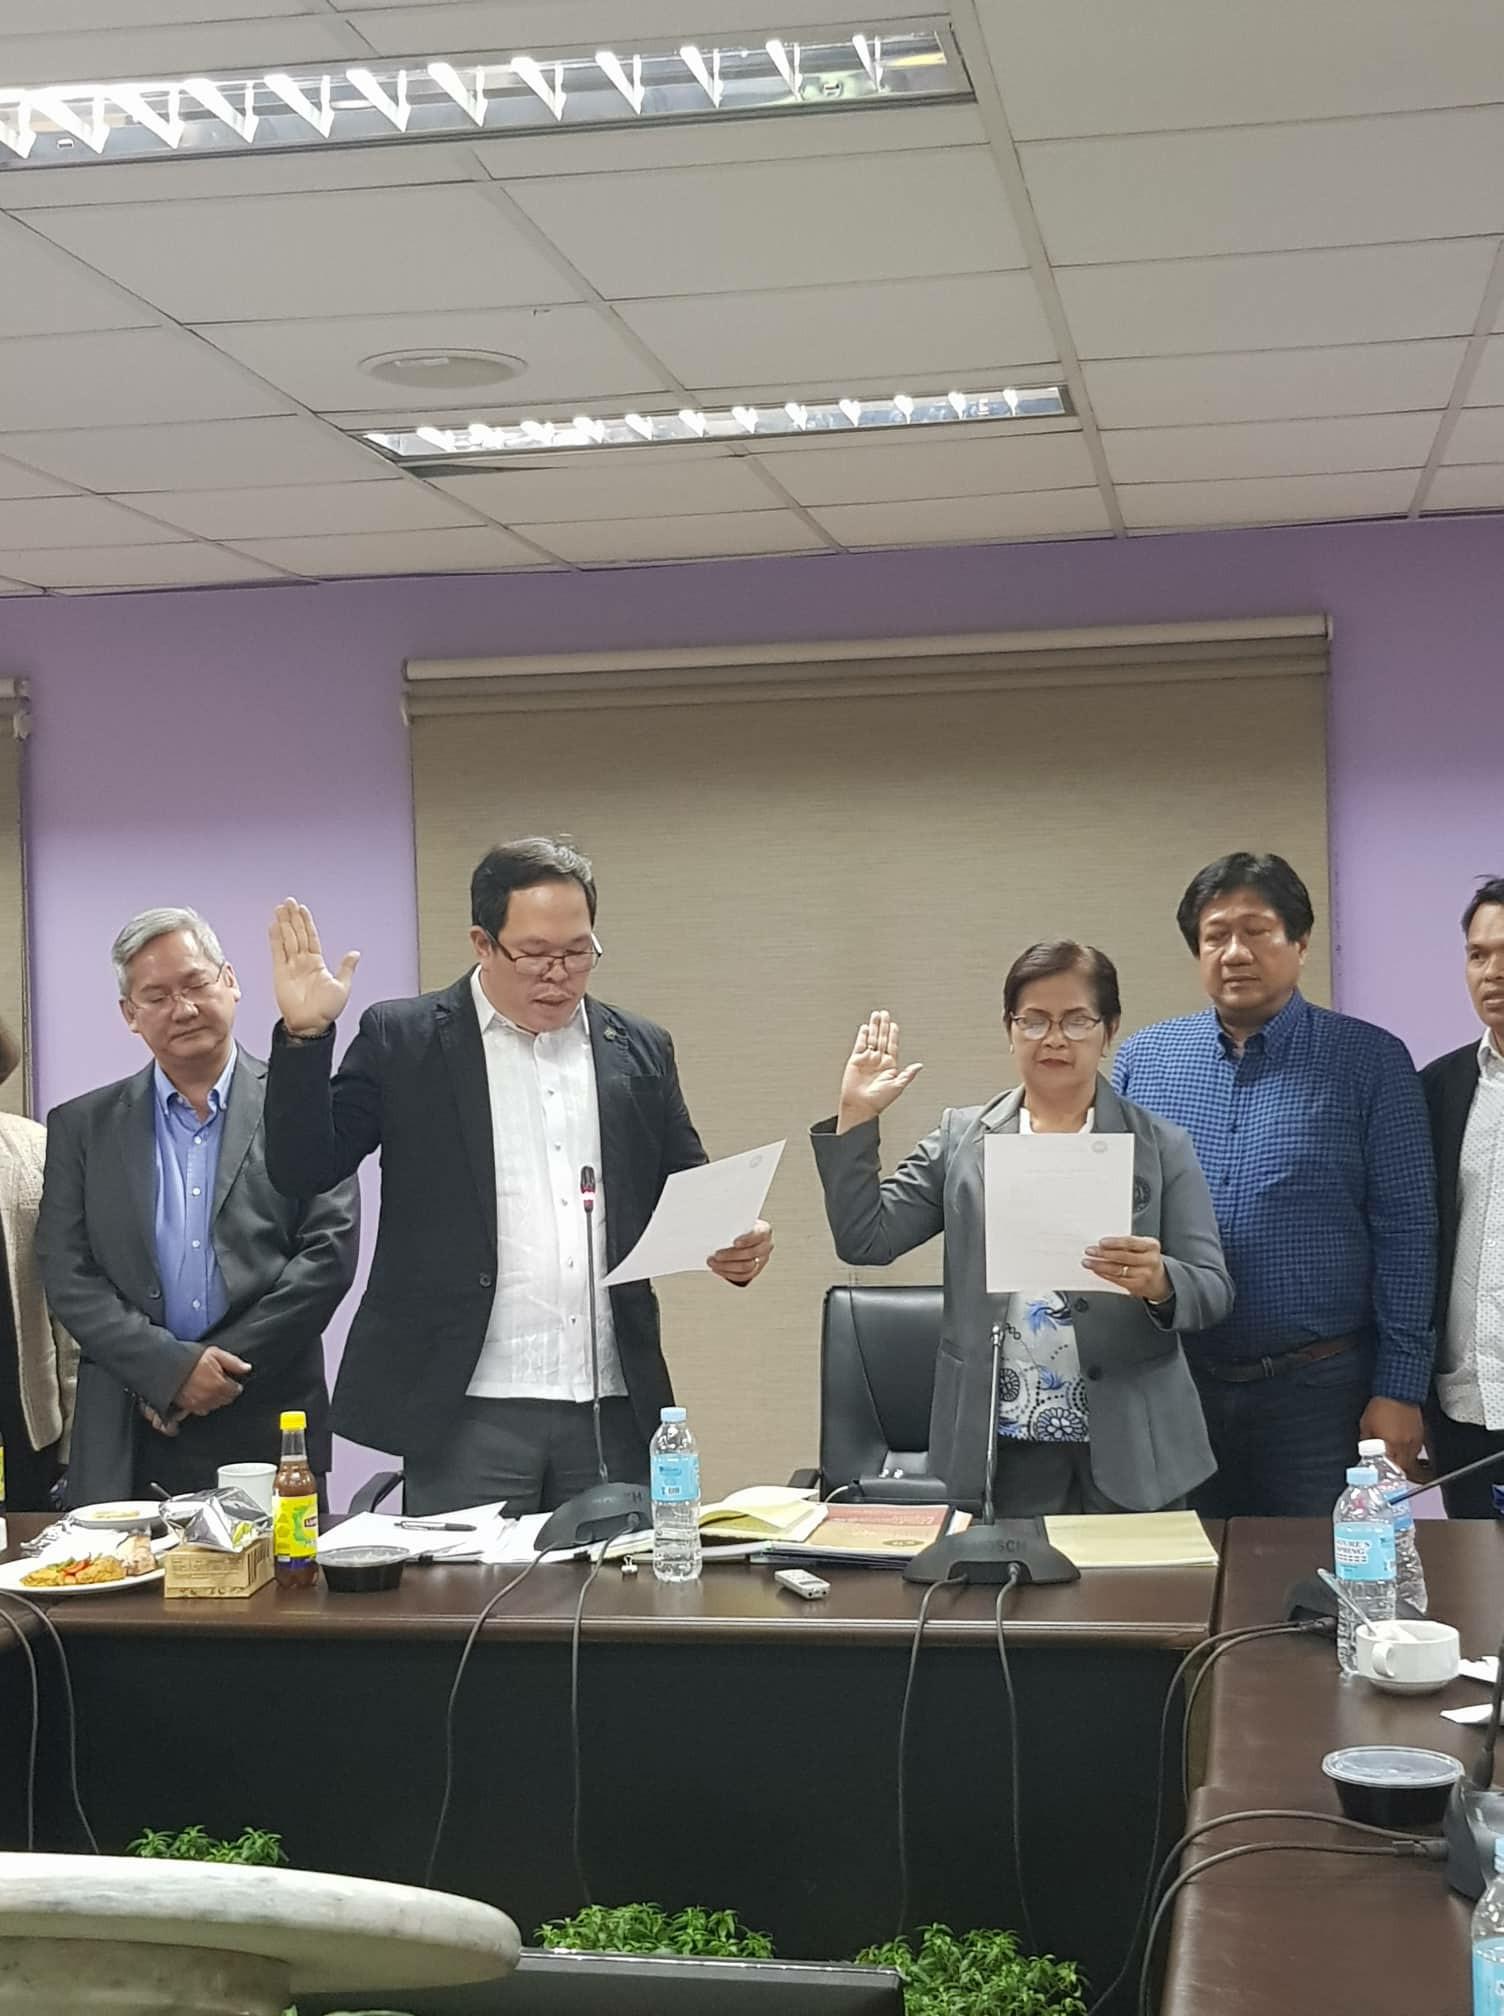 USeP BOR reappoints Generalao to presidency